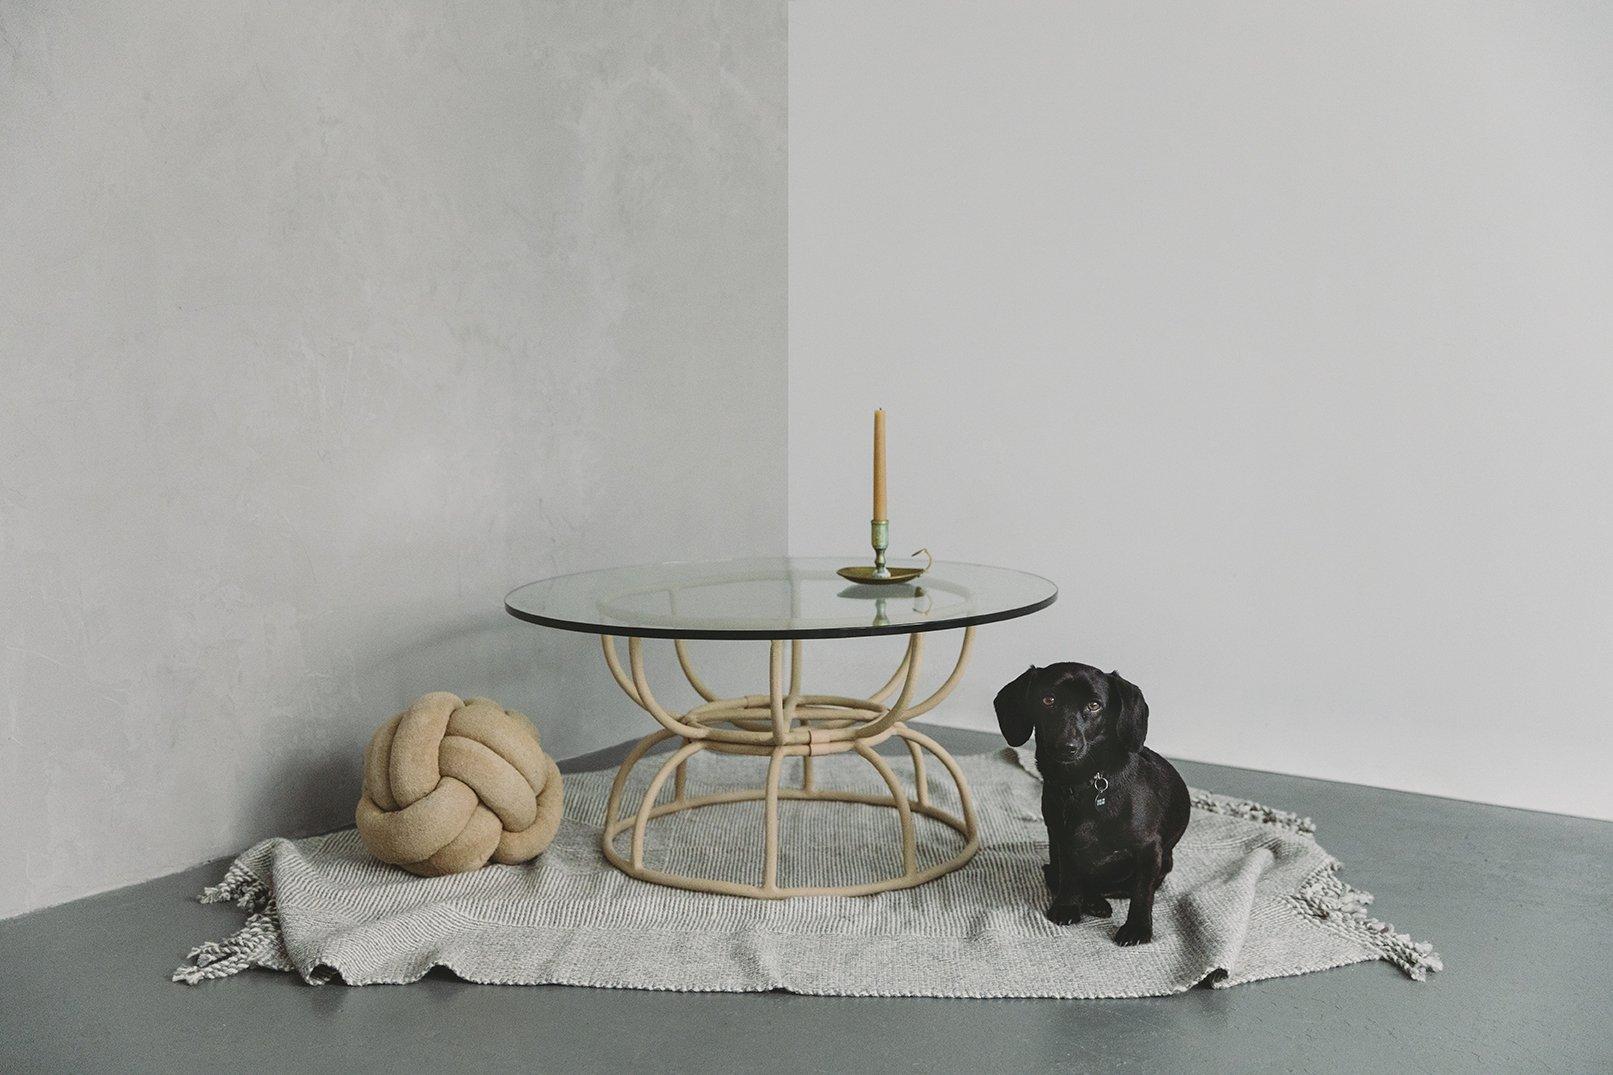 Truss Coffee Table Coffee Table Ceramic Furniture Ceramics [ 1075 x 1613 Pixel ]